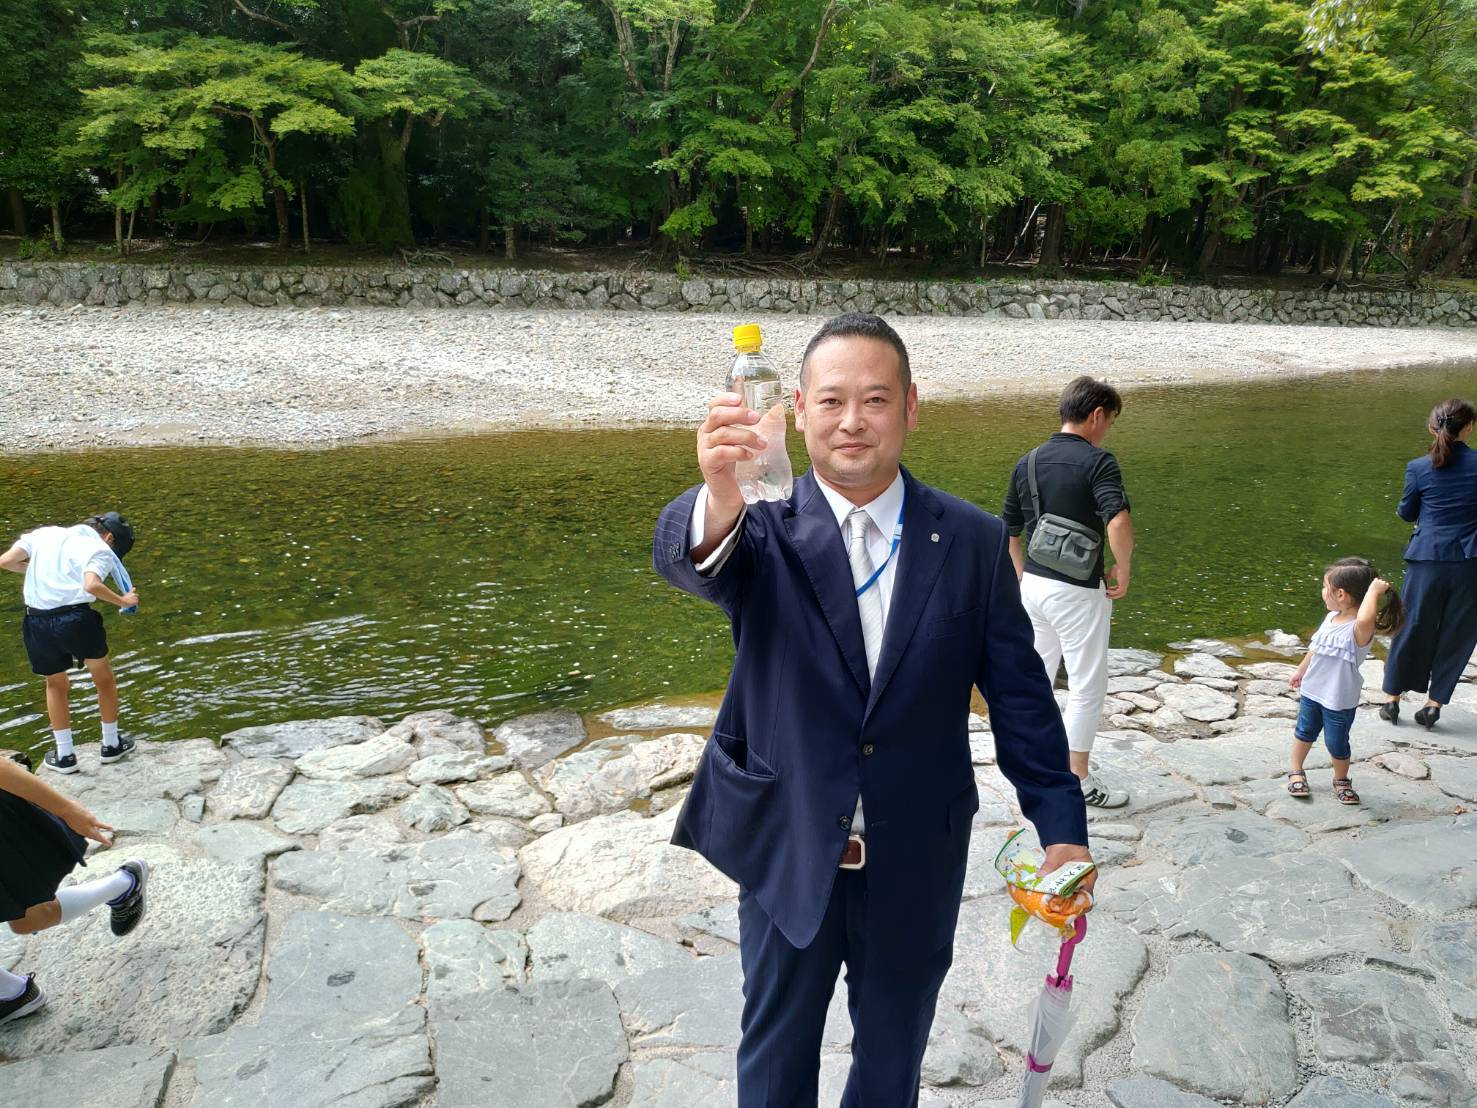 第15回親子で行く伊勢神宮参拝旅行_f0136366_08595912.jpg